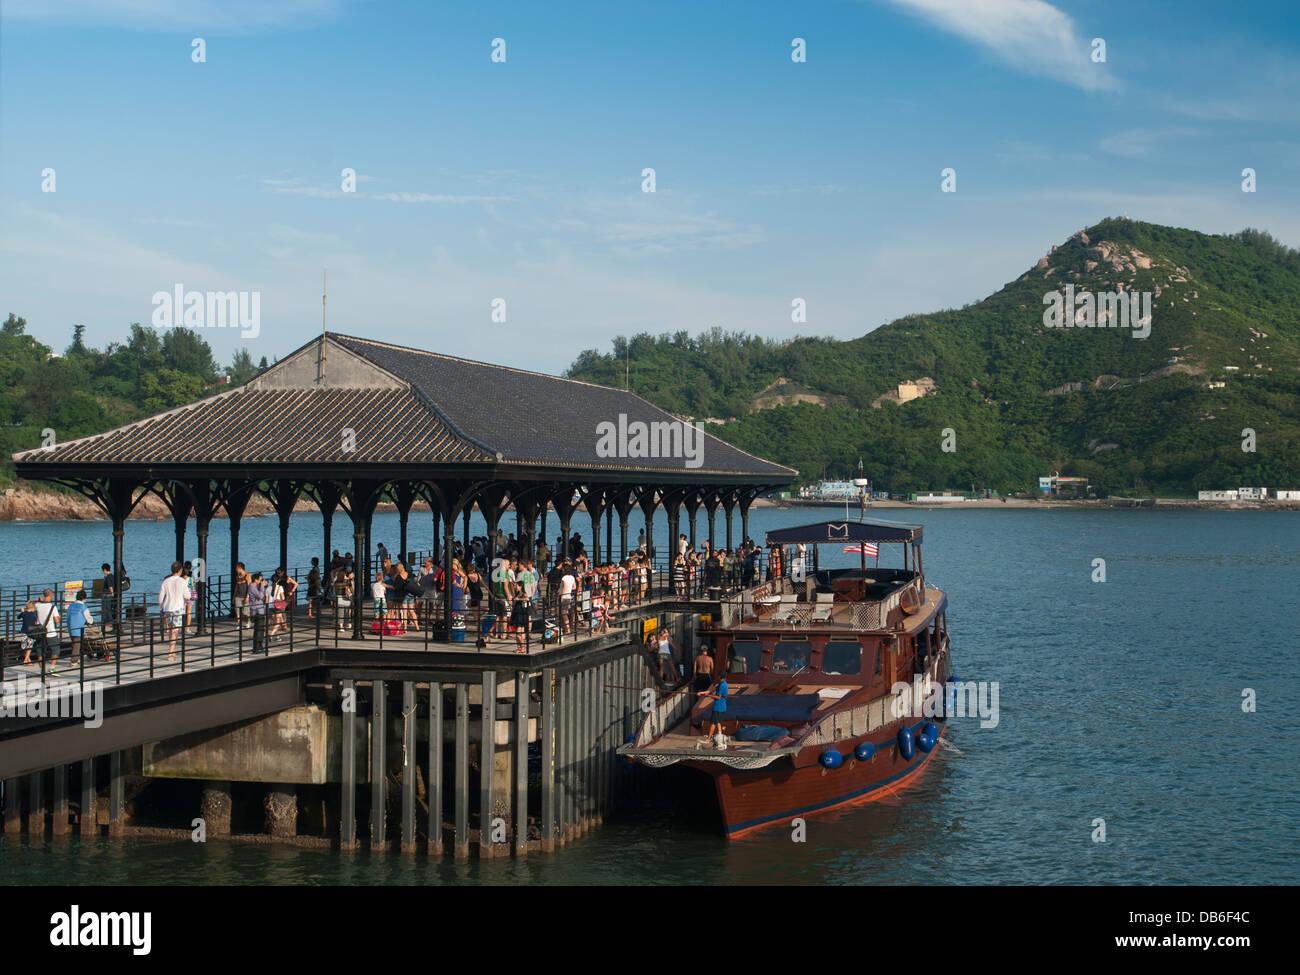 Blake Pier Tsui Wah Ferry dock at Stanley, Hong Kong China Stock Photo